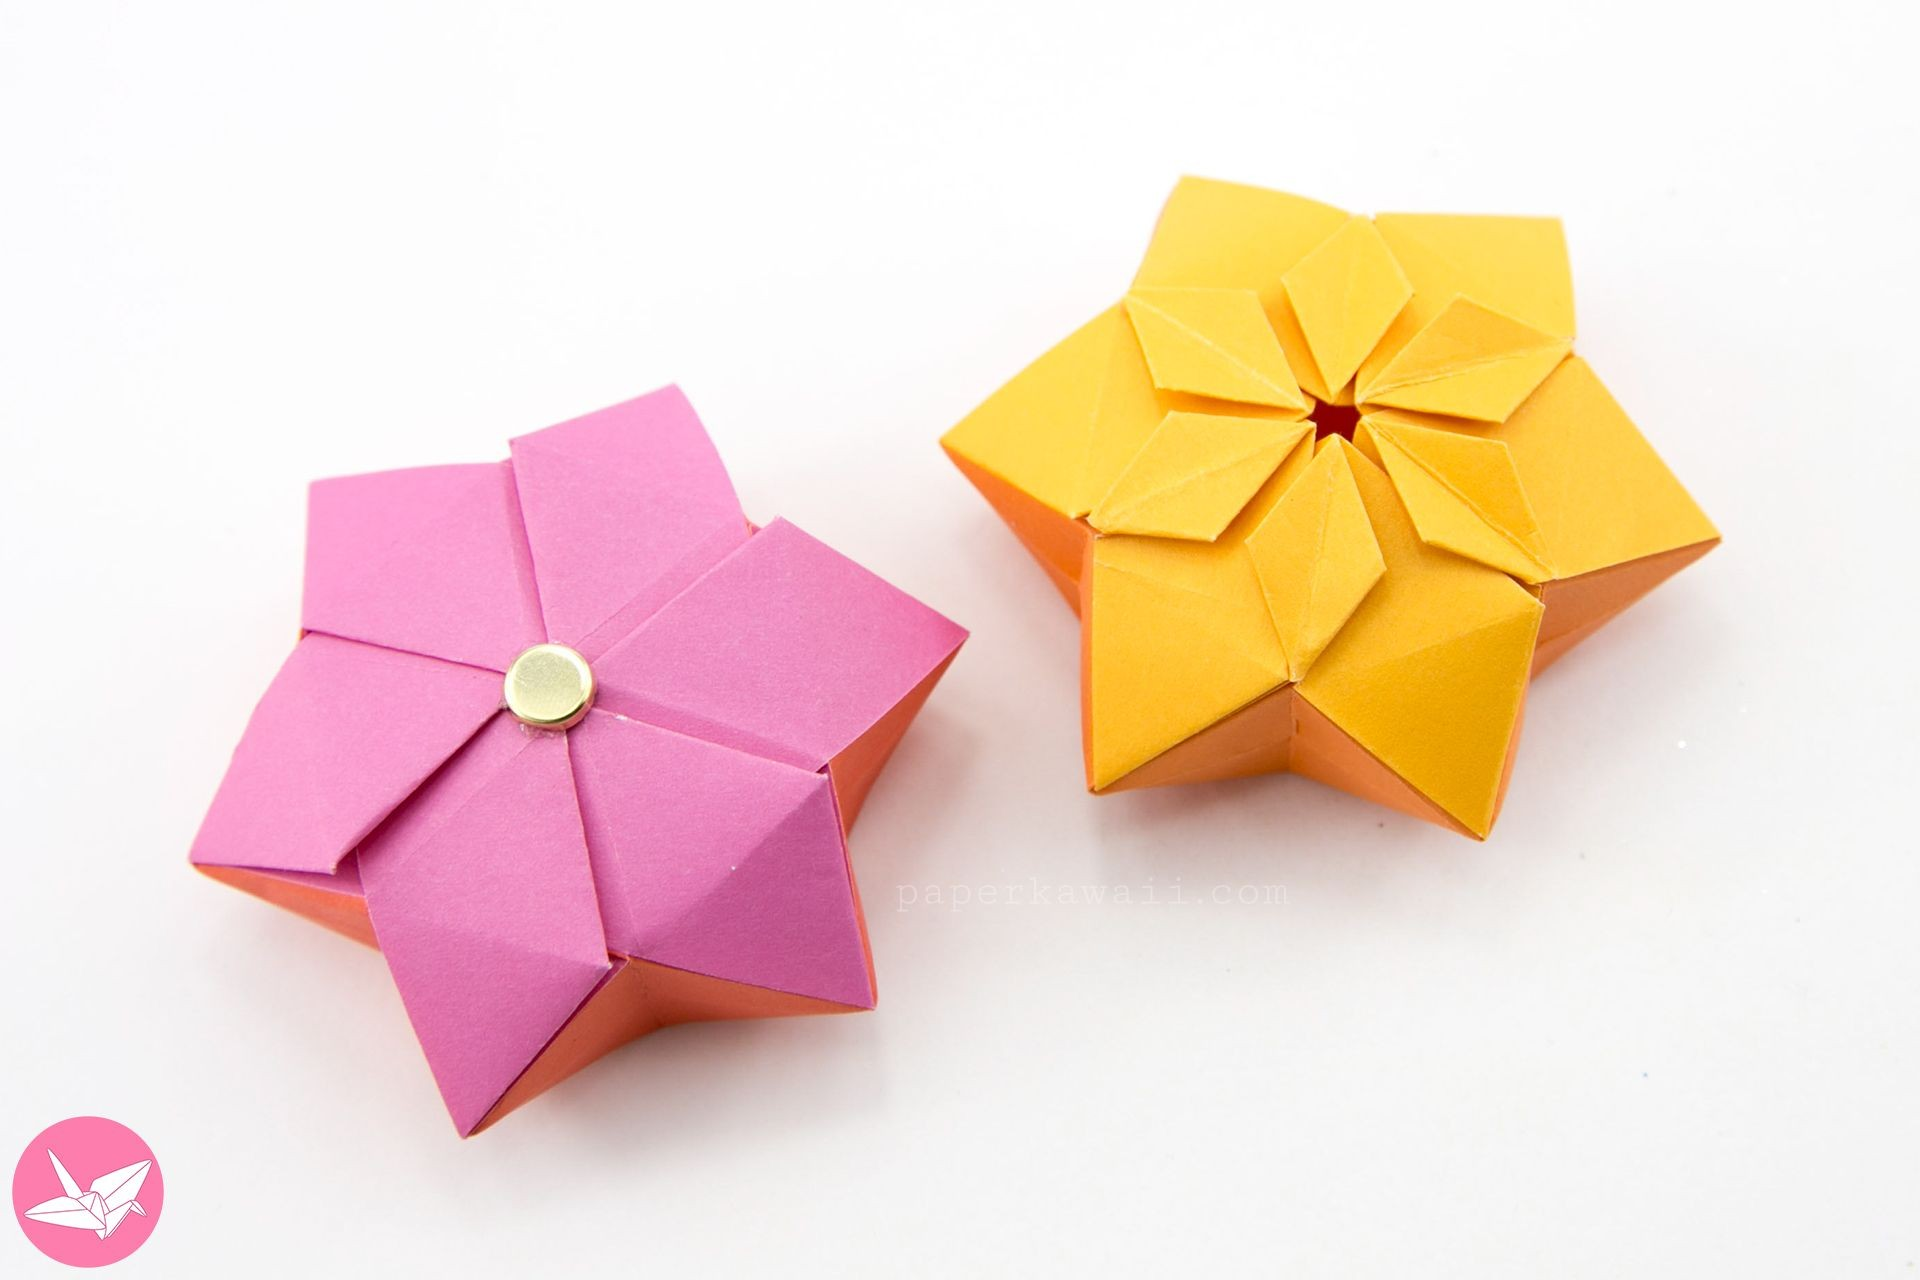 Star Papercraft origami Hexagonal Puffy Star Tutorial